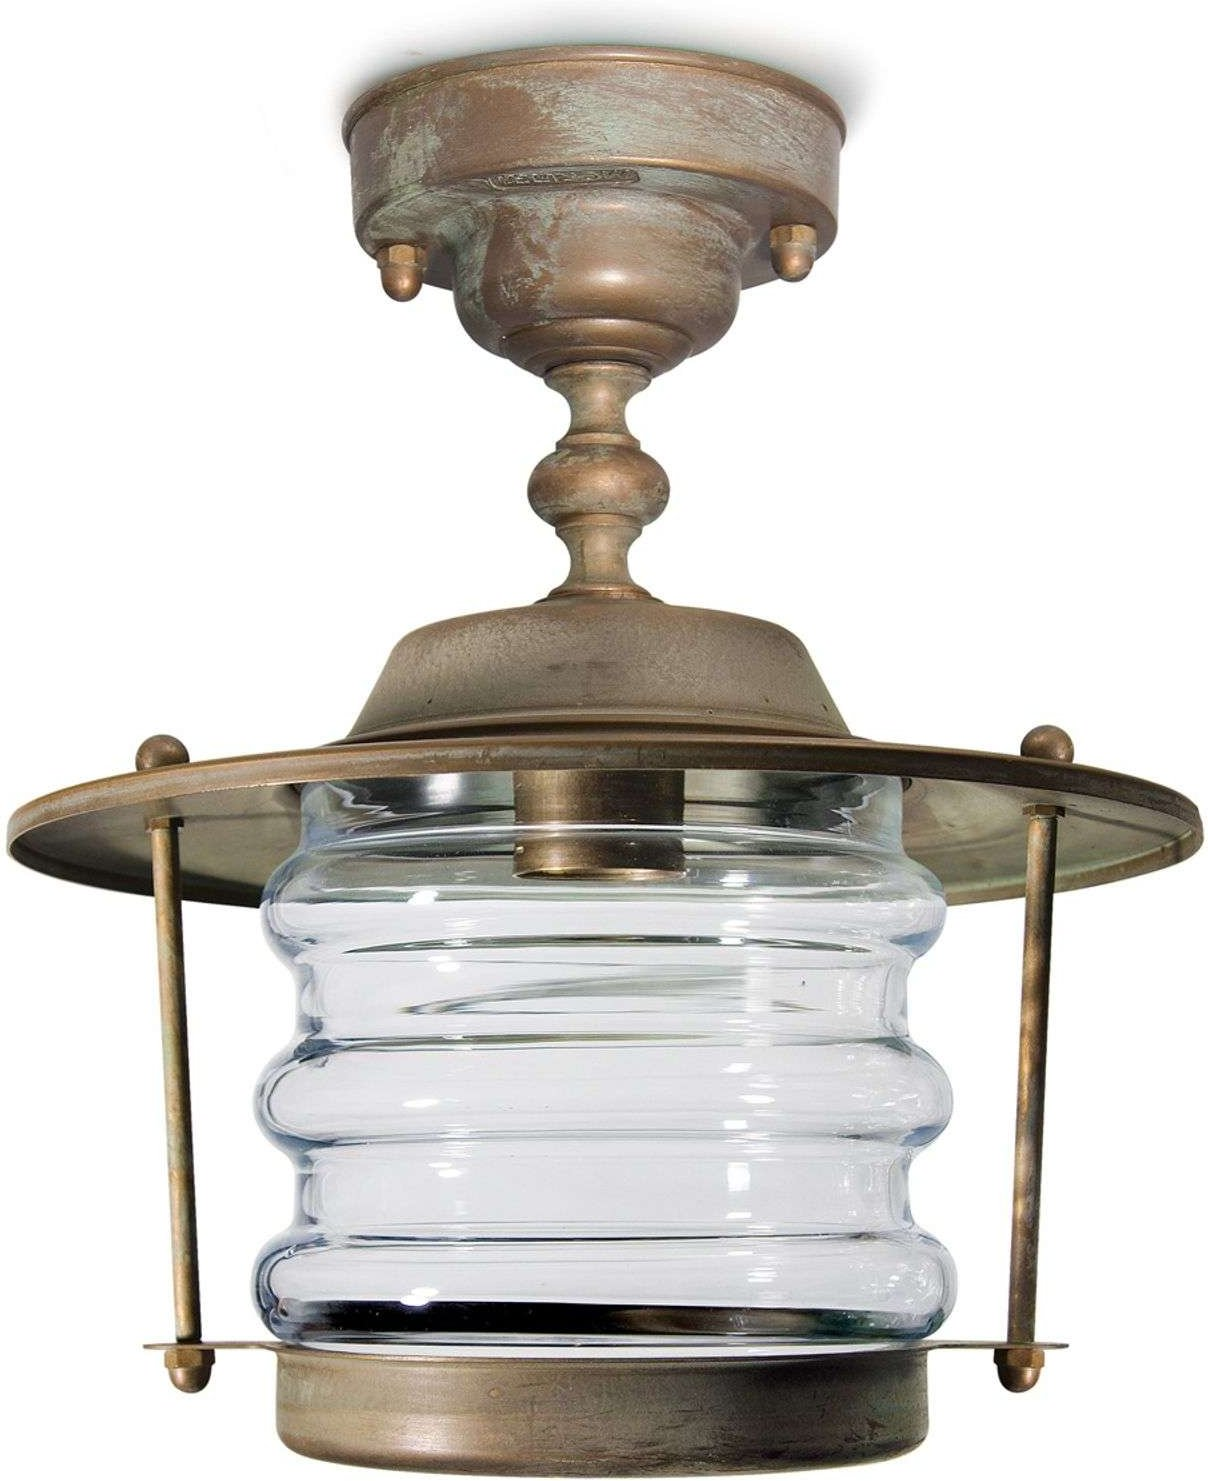 Outdoor ceiling light Adessora seawater res